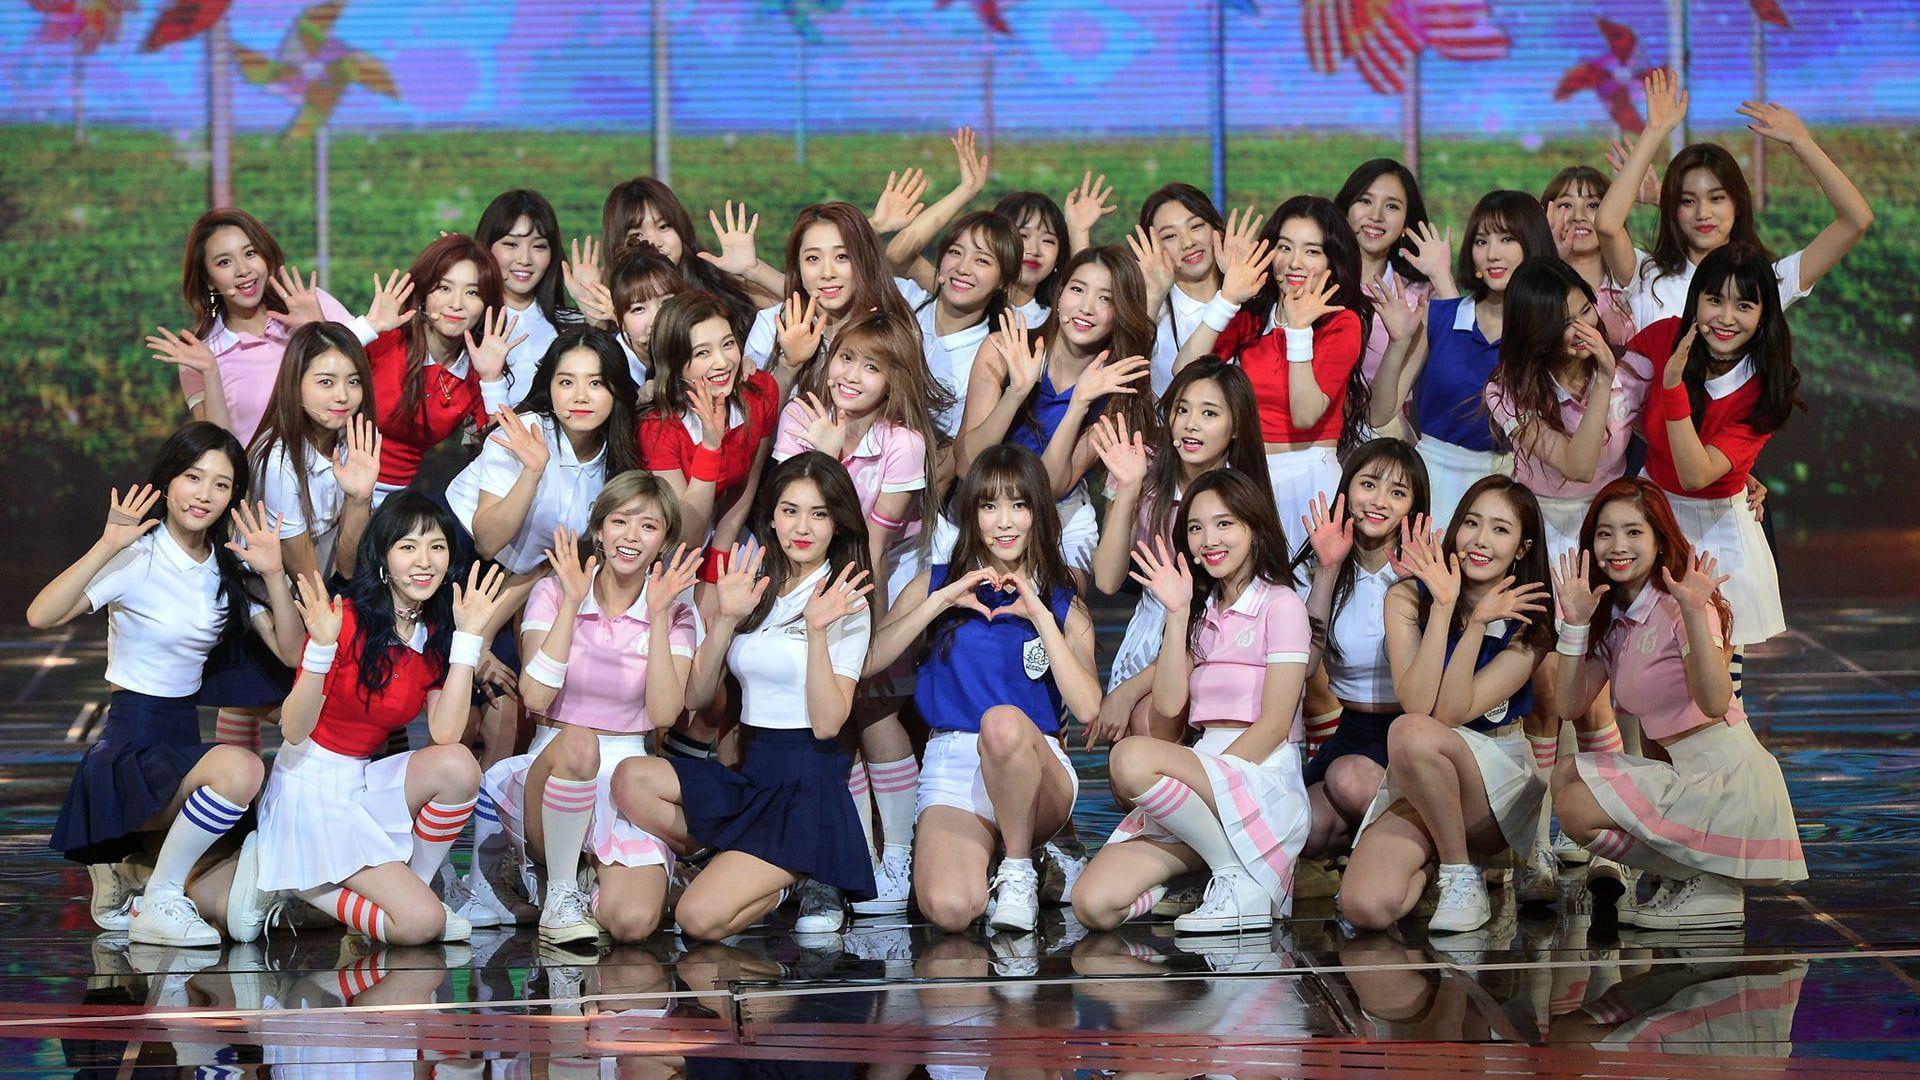 K Pop Redvelvet Twice Gfriend Women 1080p Wallpaper Hdwallpaper Desktop Kpop Girl Groups Kpop Girls Girl Bands